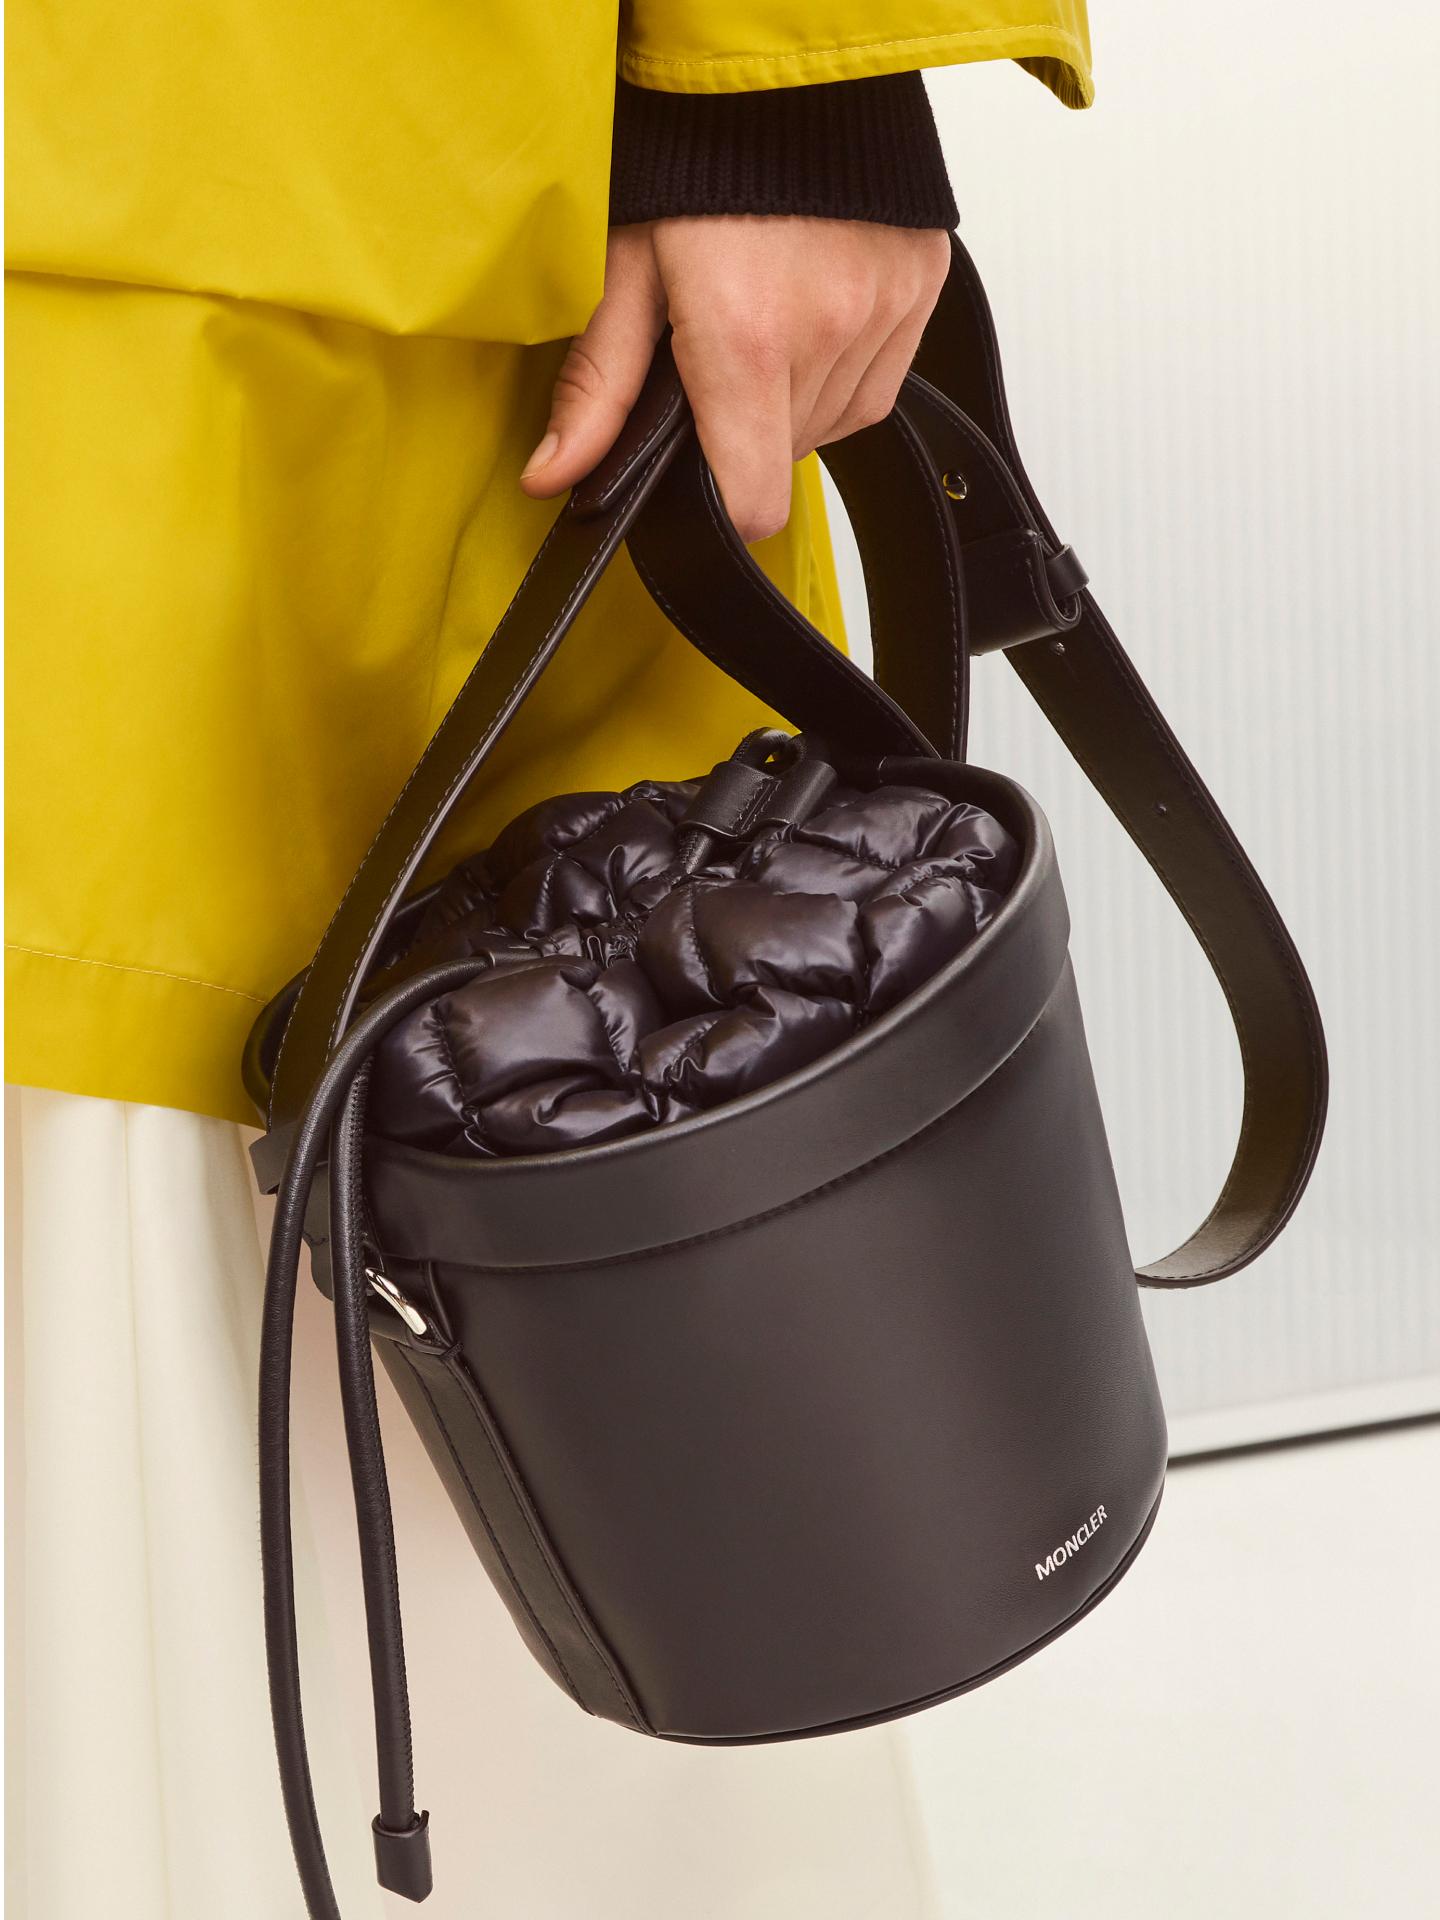 Moncler black handbag